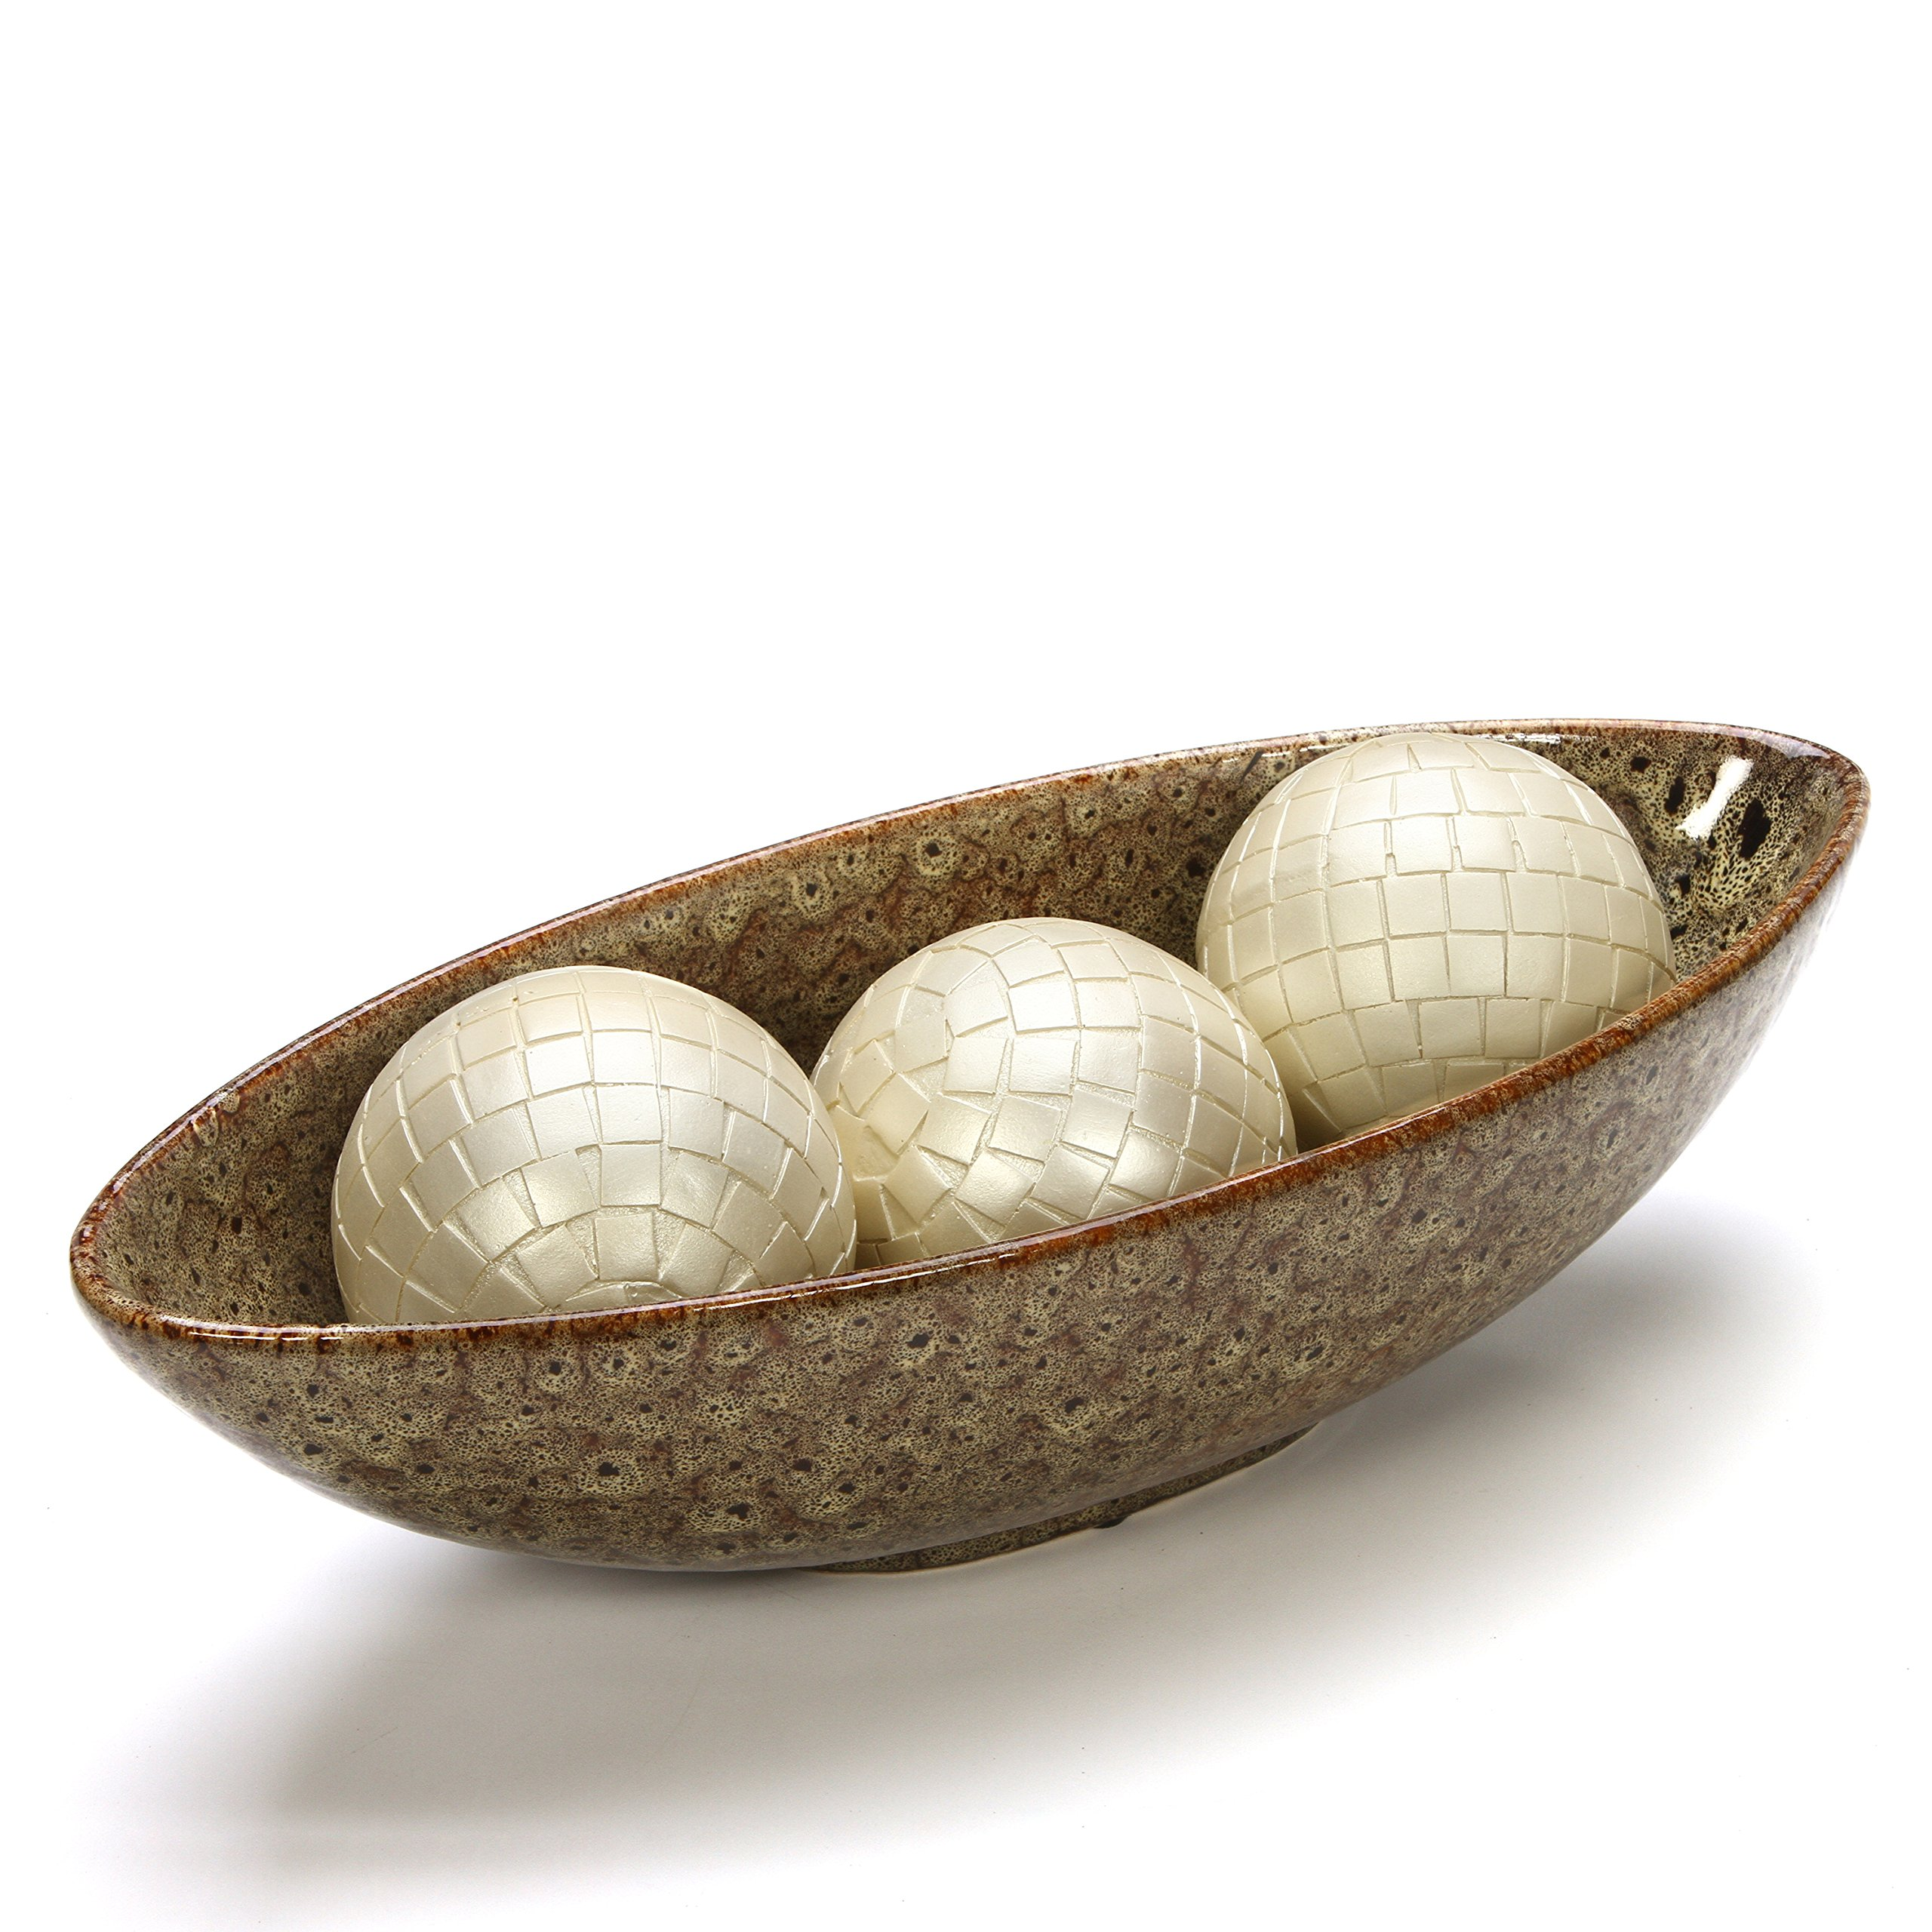 Hosley 15.75'' Long Ceramic Bowl, Ideal for Potpourri, Orbs. Ideal Gift for Wedding, Bridal, Party, Home Decor, LED Votive Tea Light Gardens O3